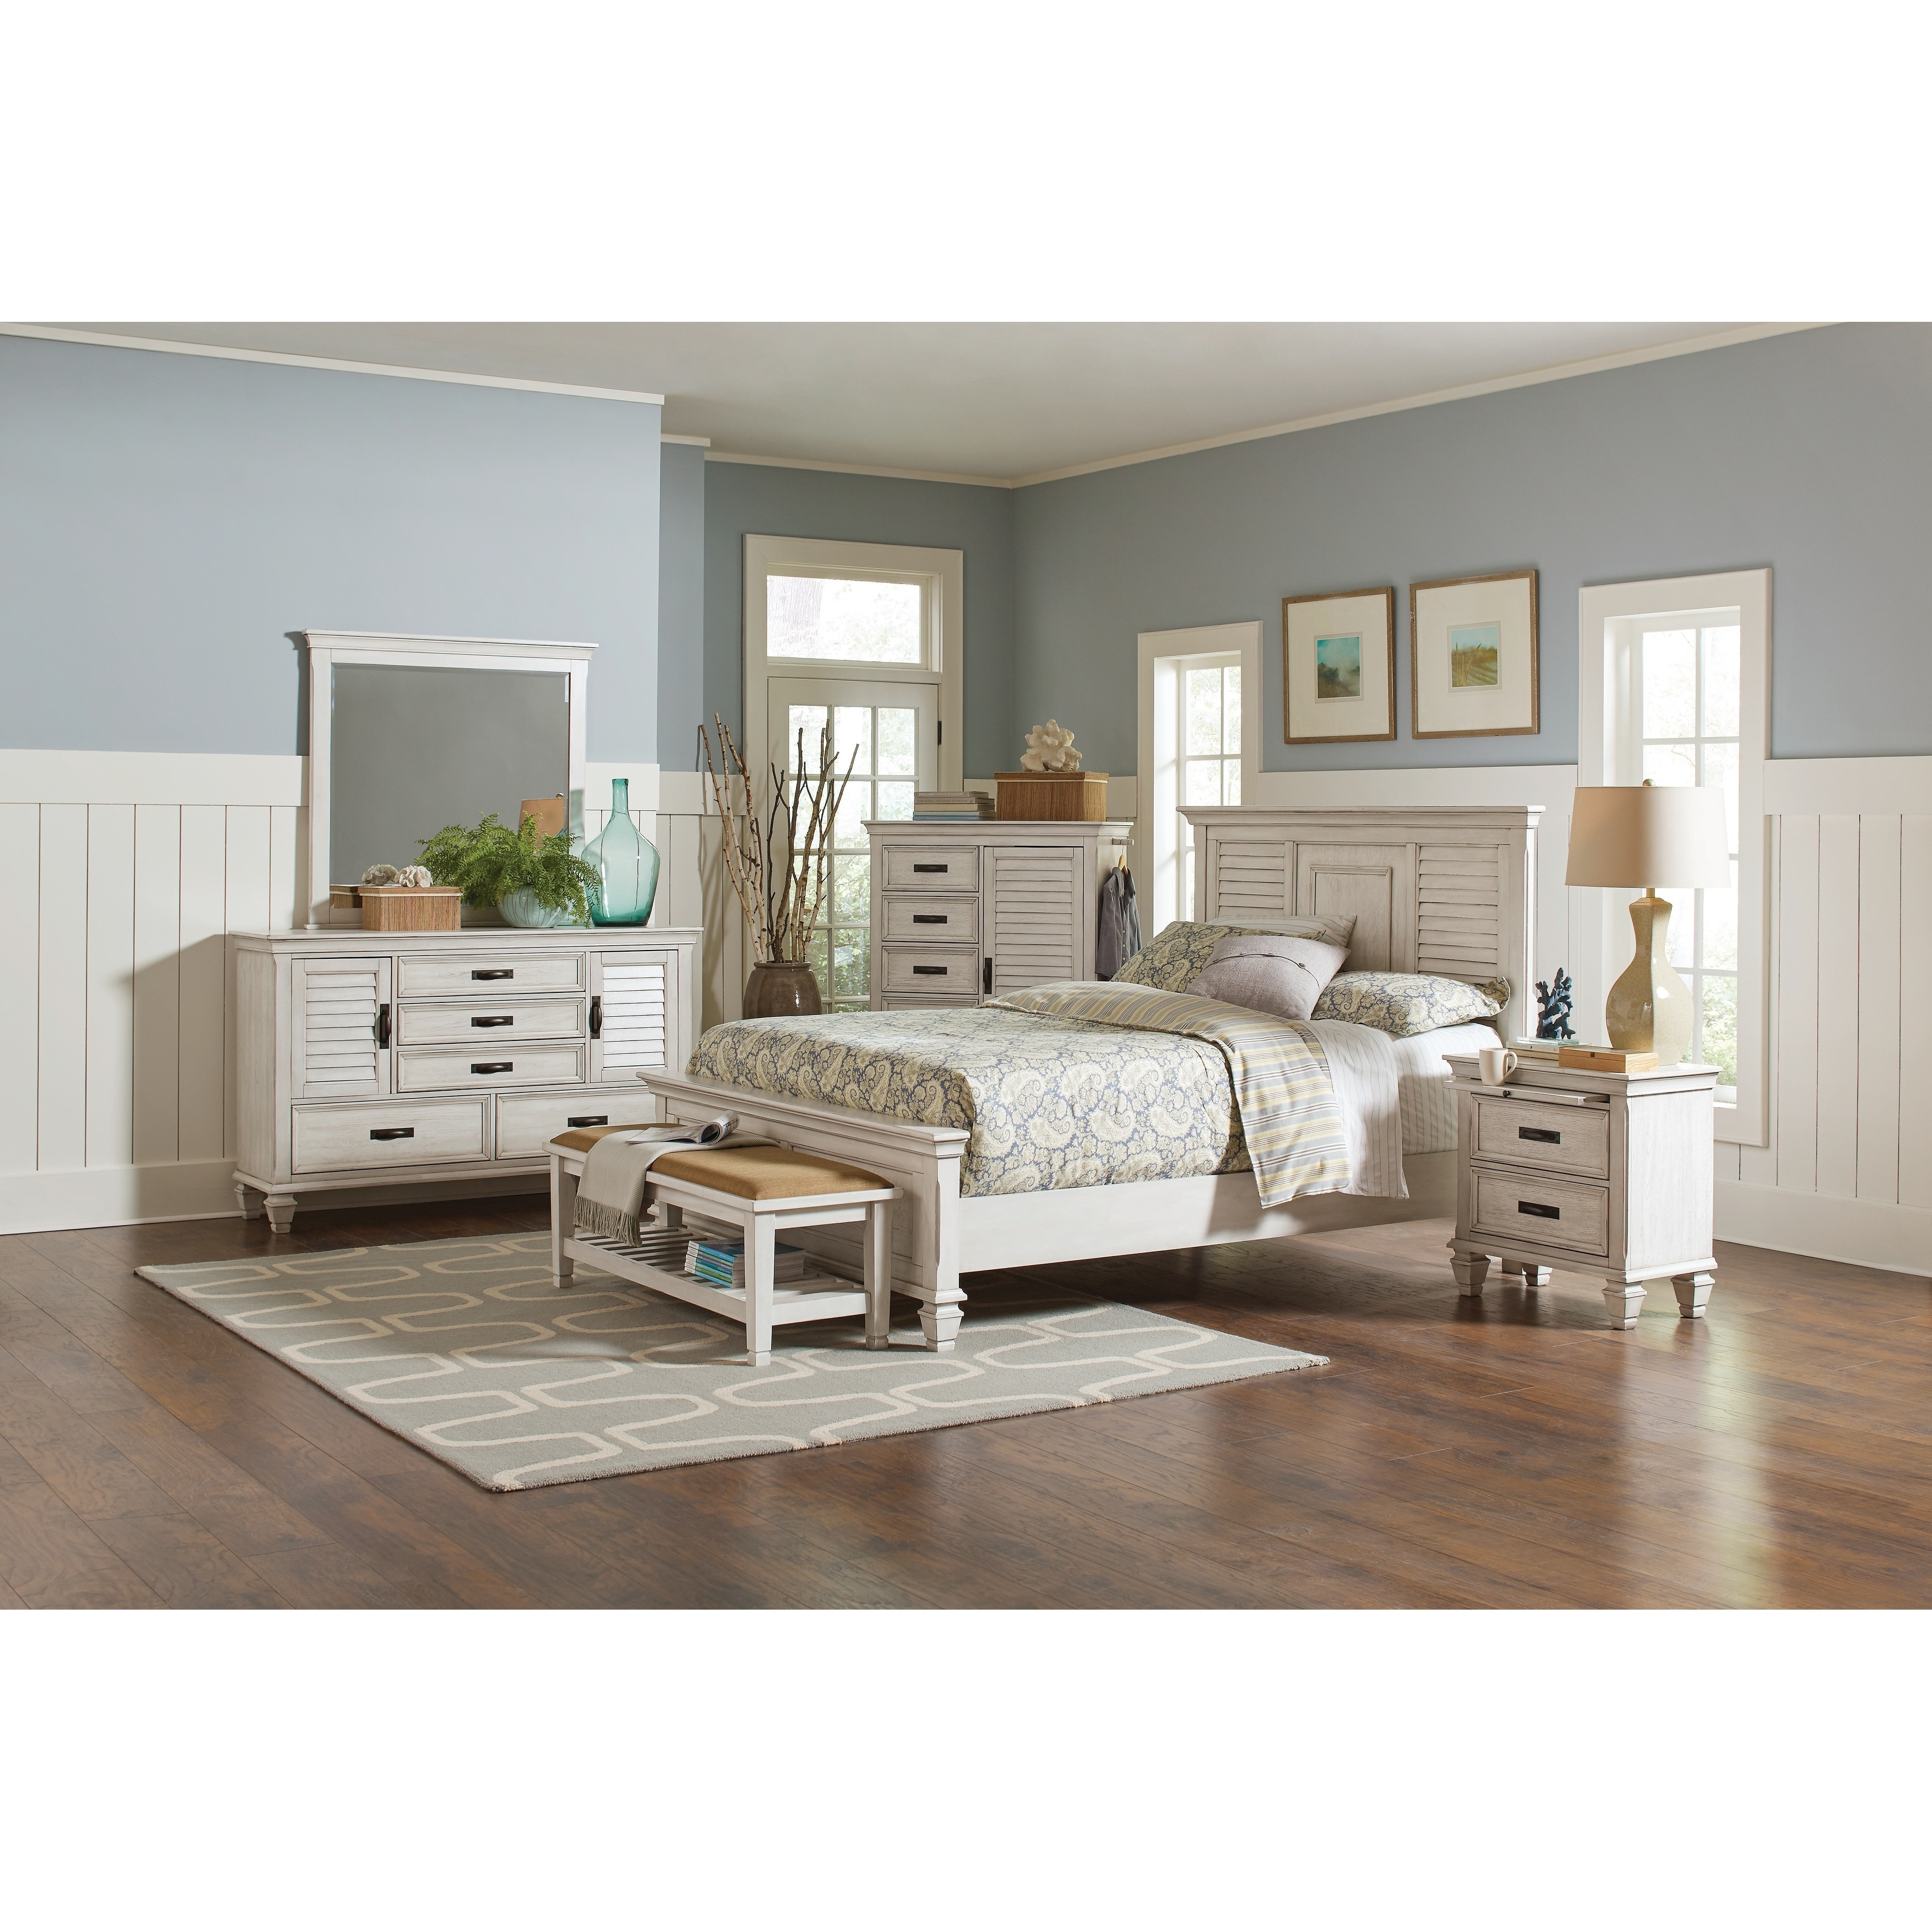 Shop Franco Antique White 5 Piece Bedroom Set Overstock 21585978